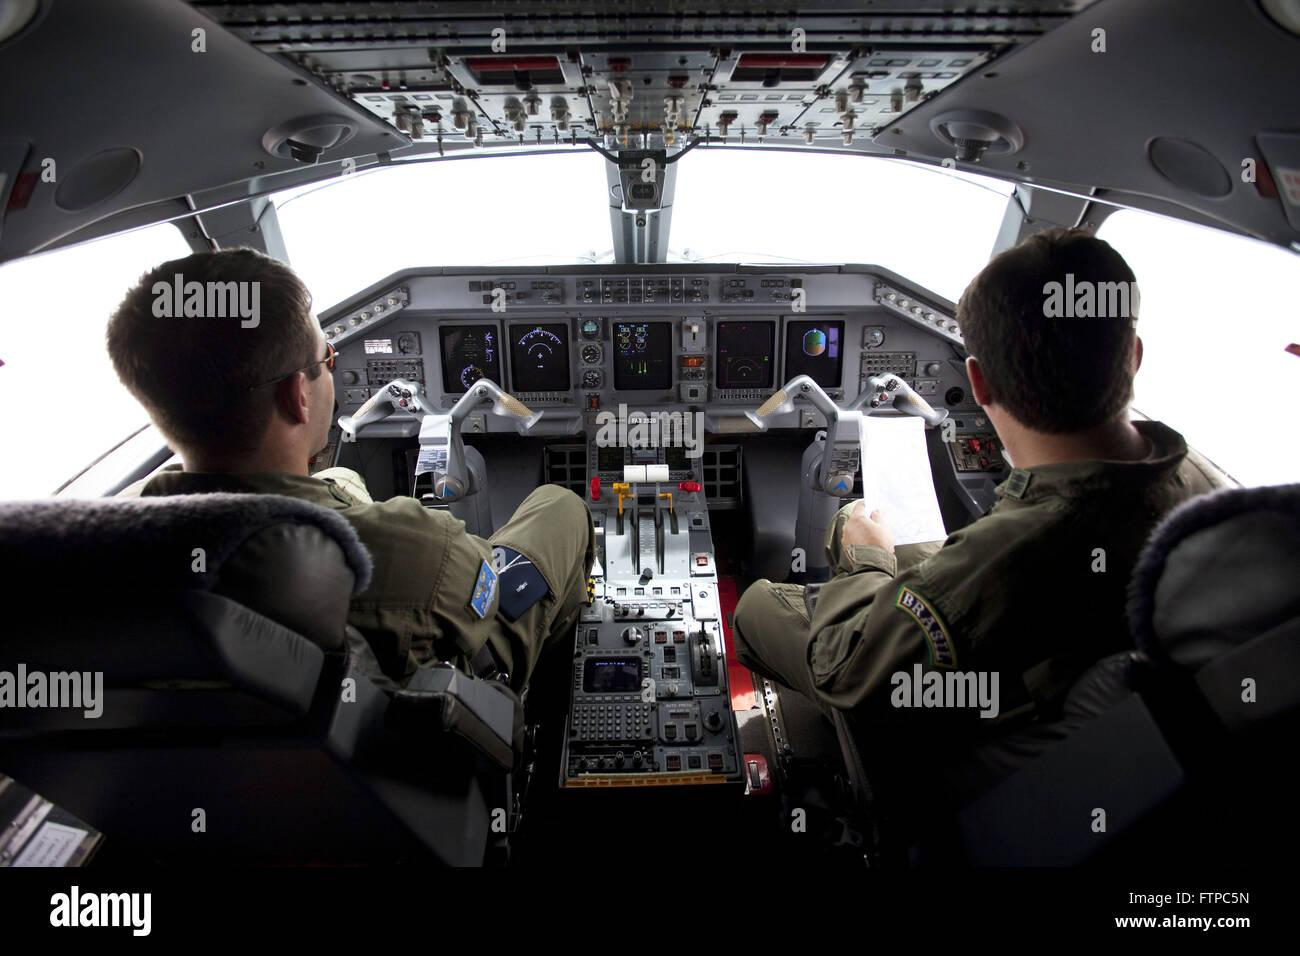 Cockpit Aircraft Embraer ERJ 145 C-99 FAB Forca Aerea Brasileira - Stock Image